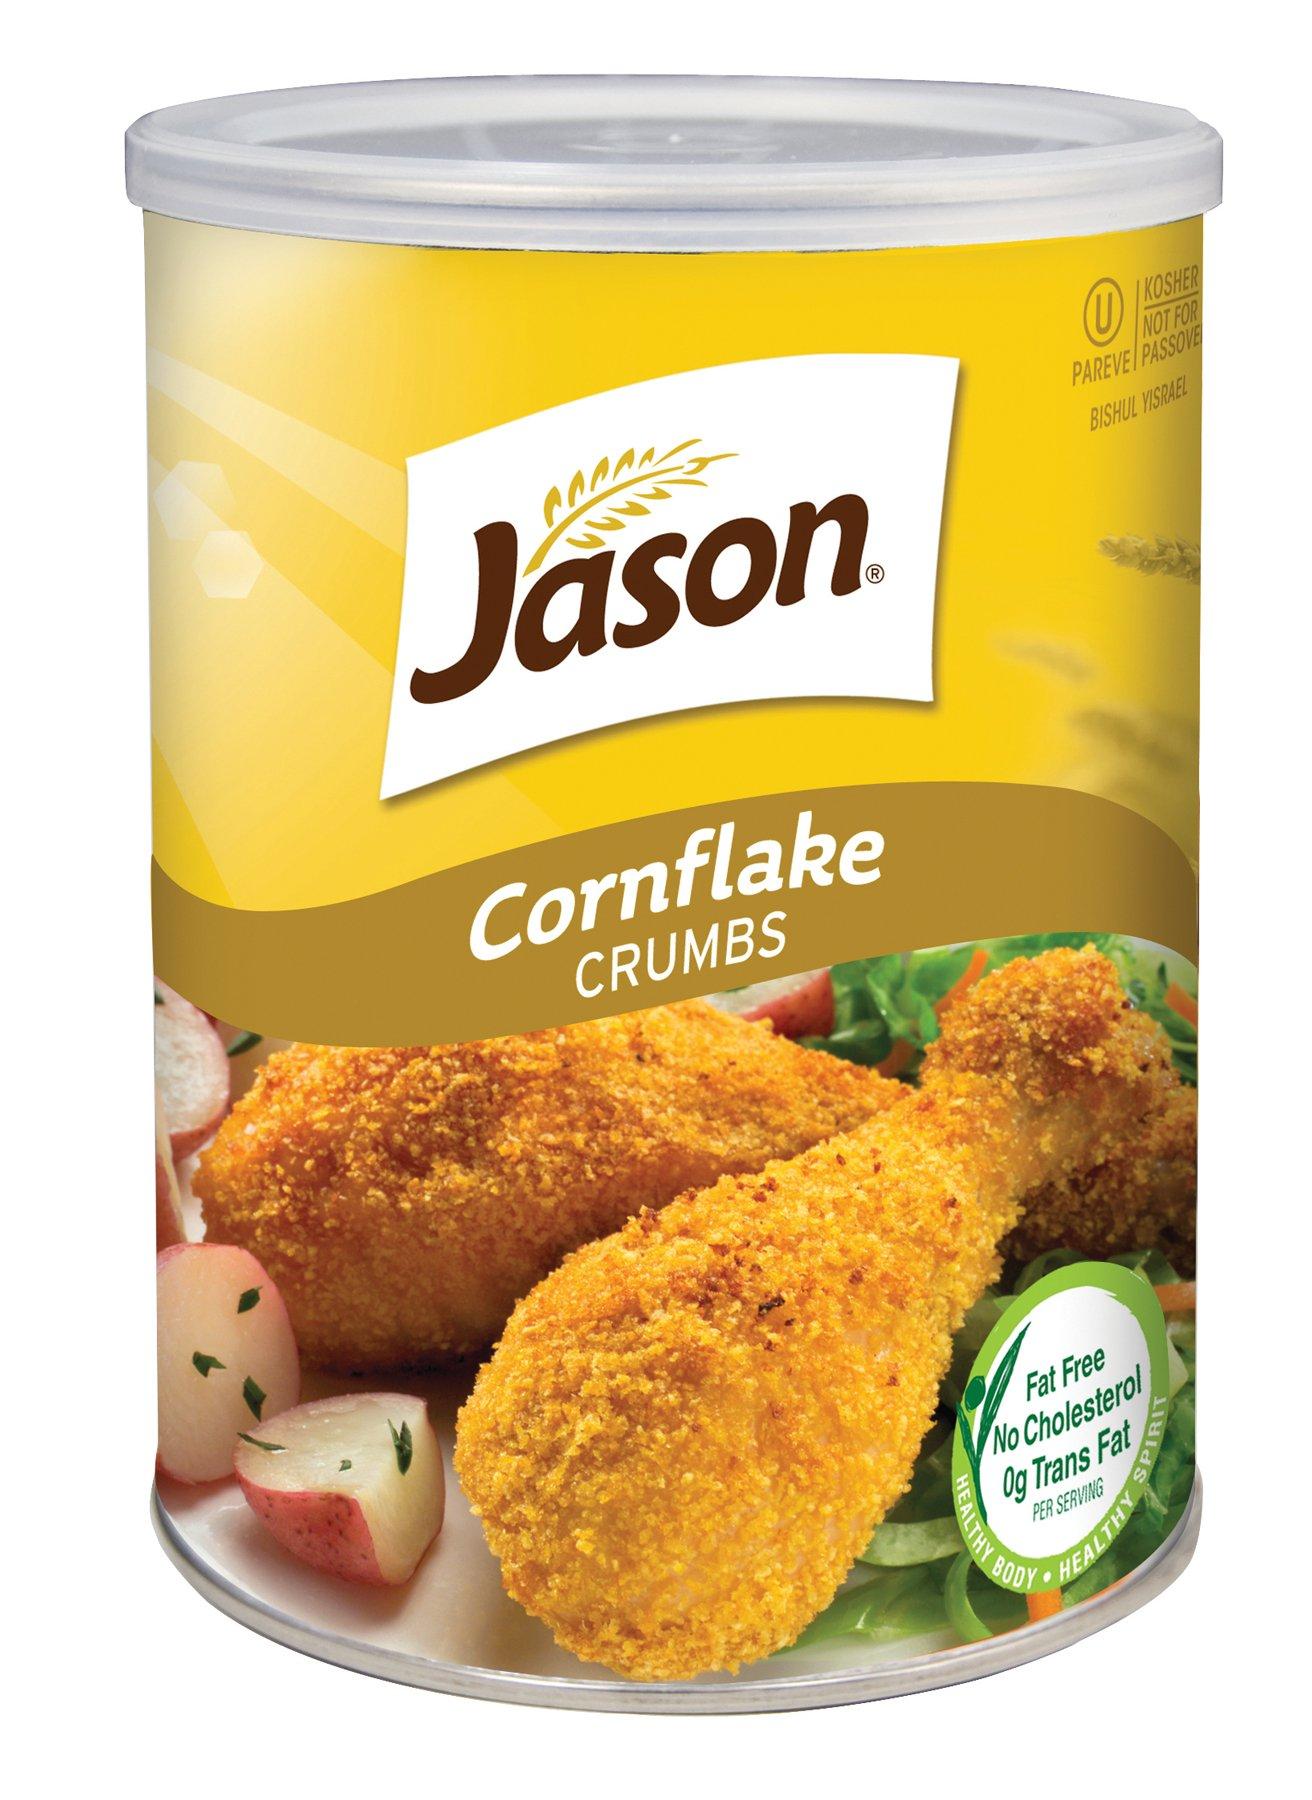 Jason Plain Corn Flake Crumbs, 12 Ounce